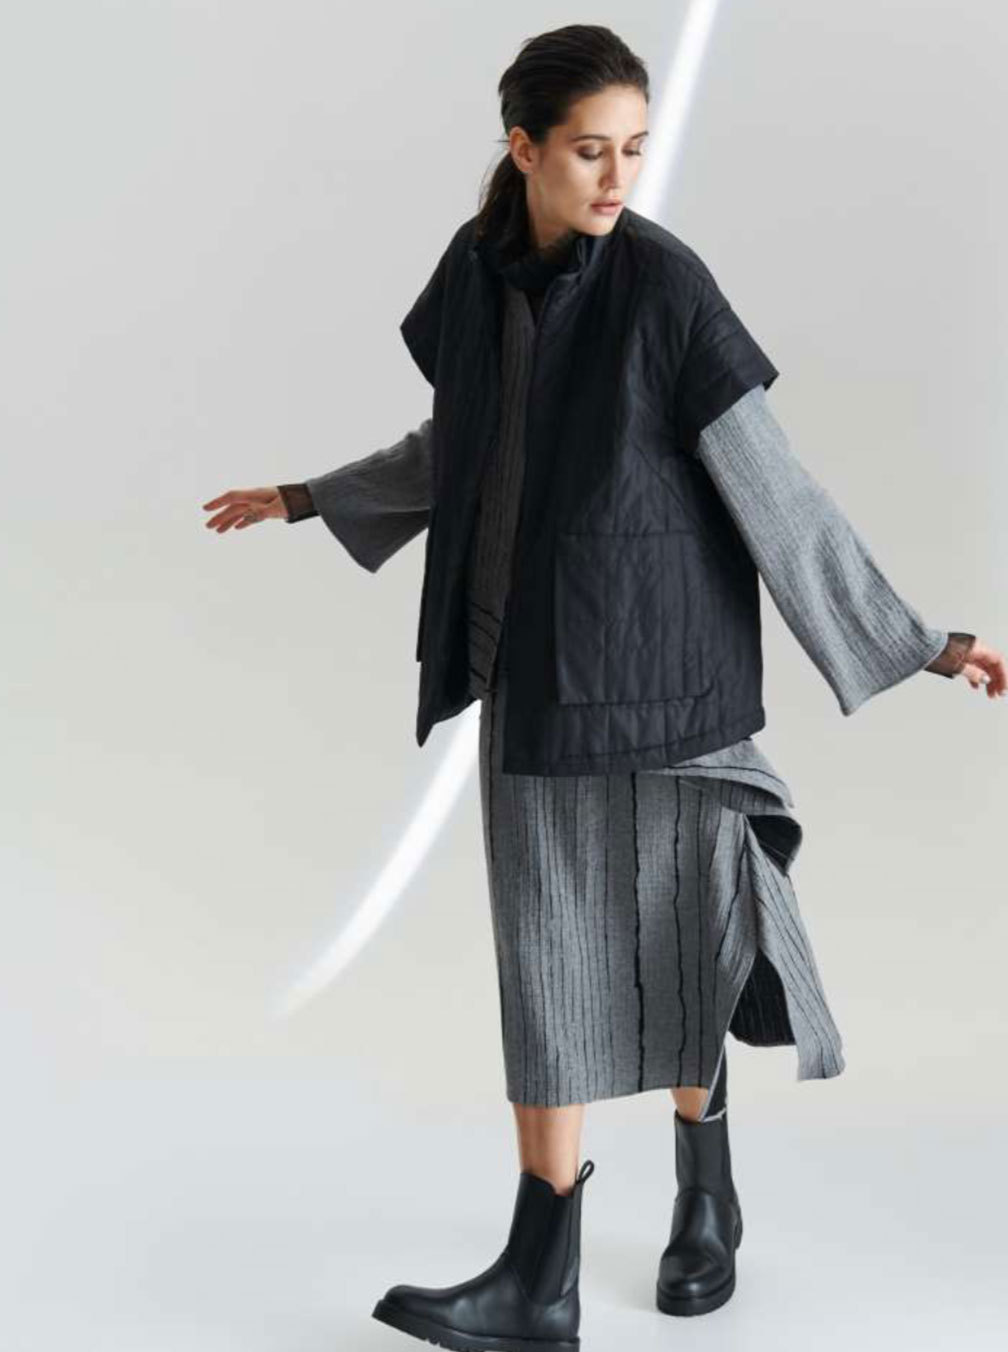 Kedziorek-giacca-nera-donna-20